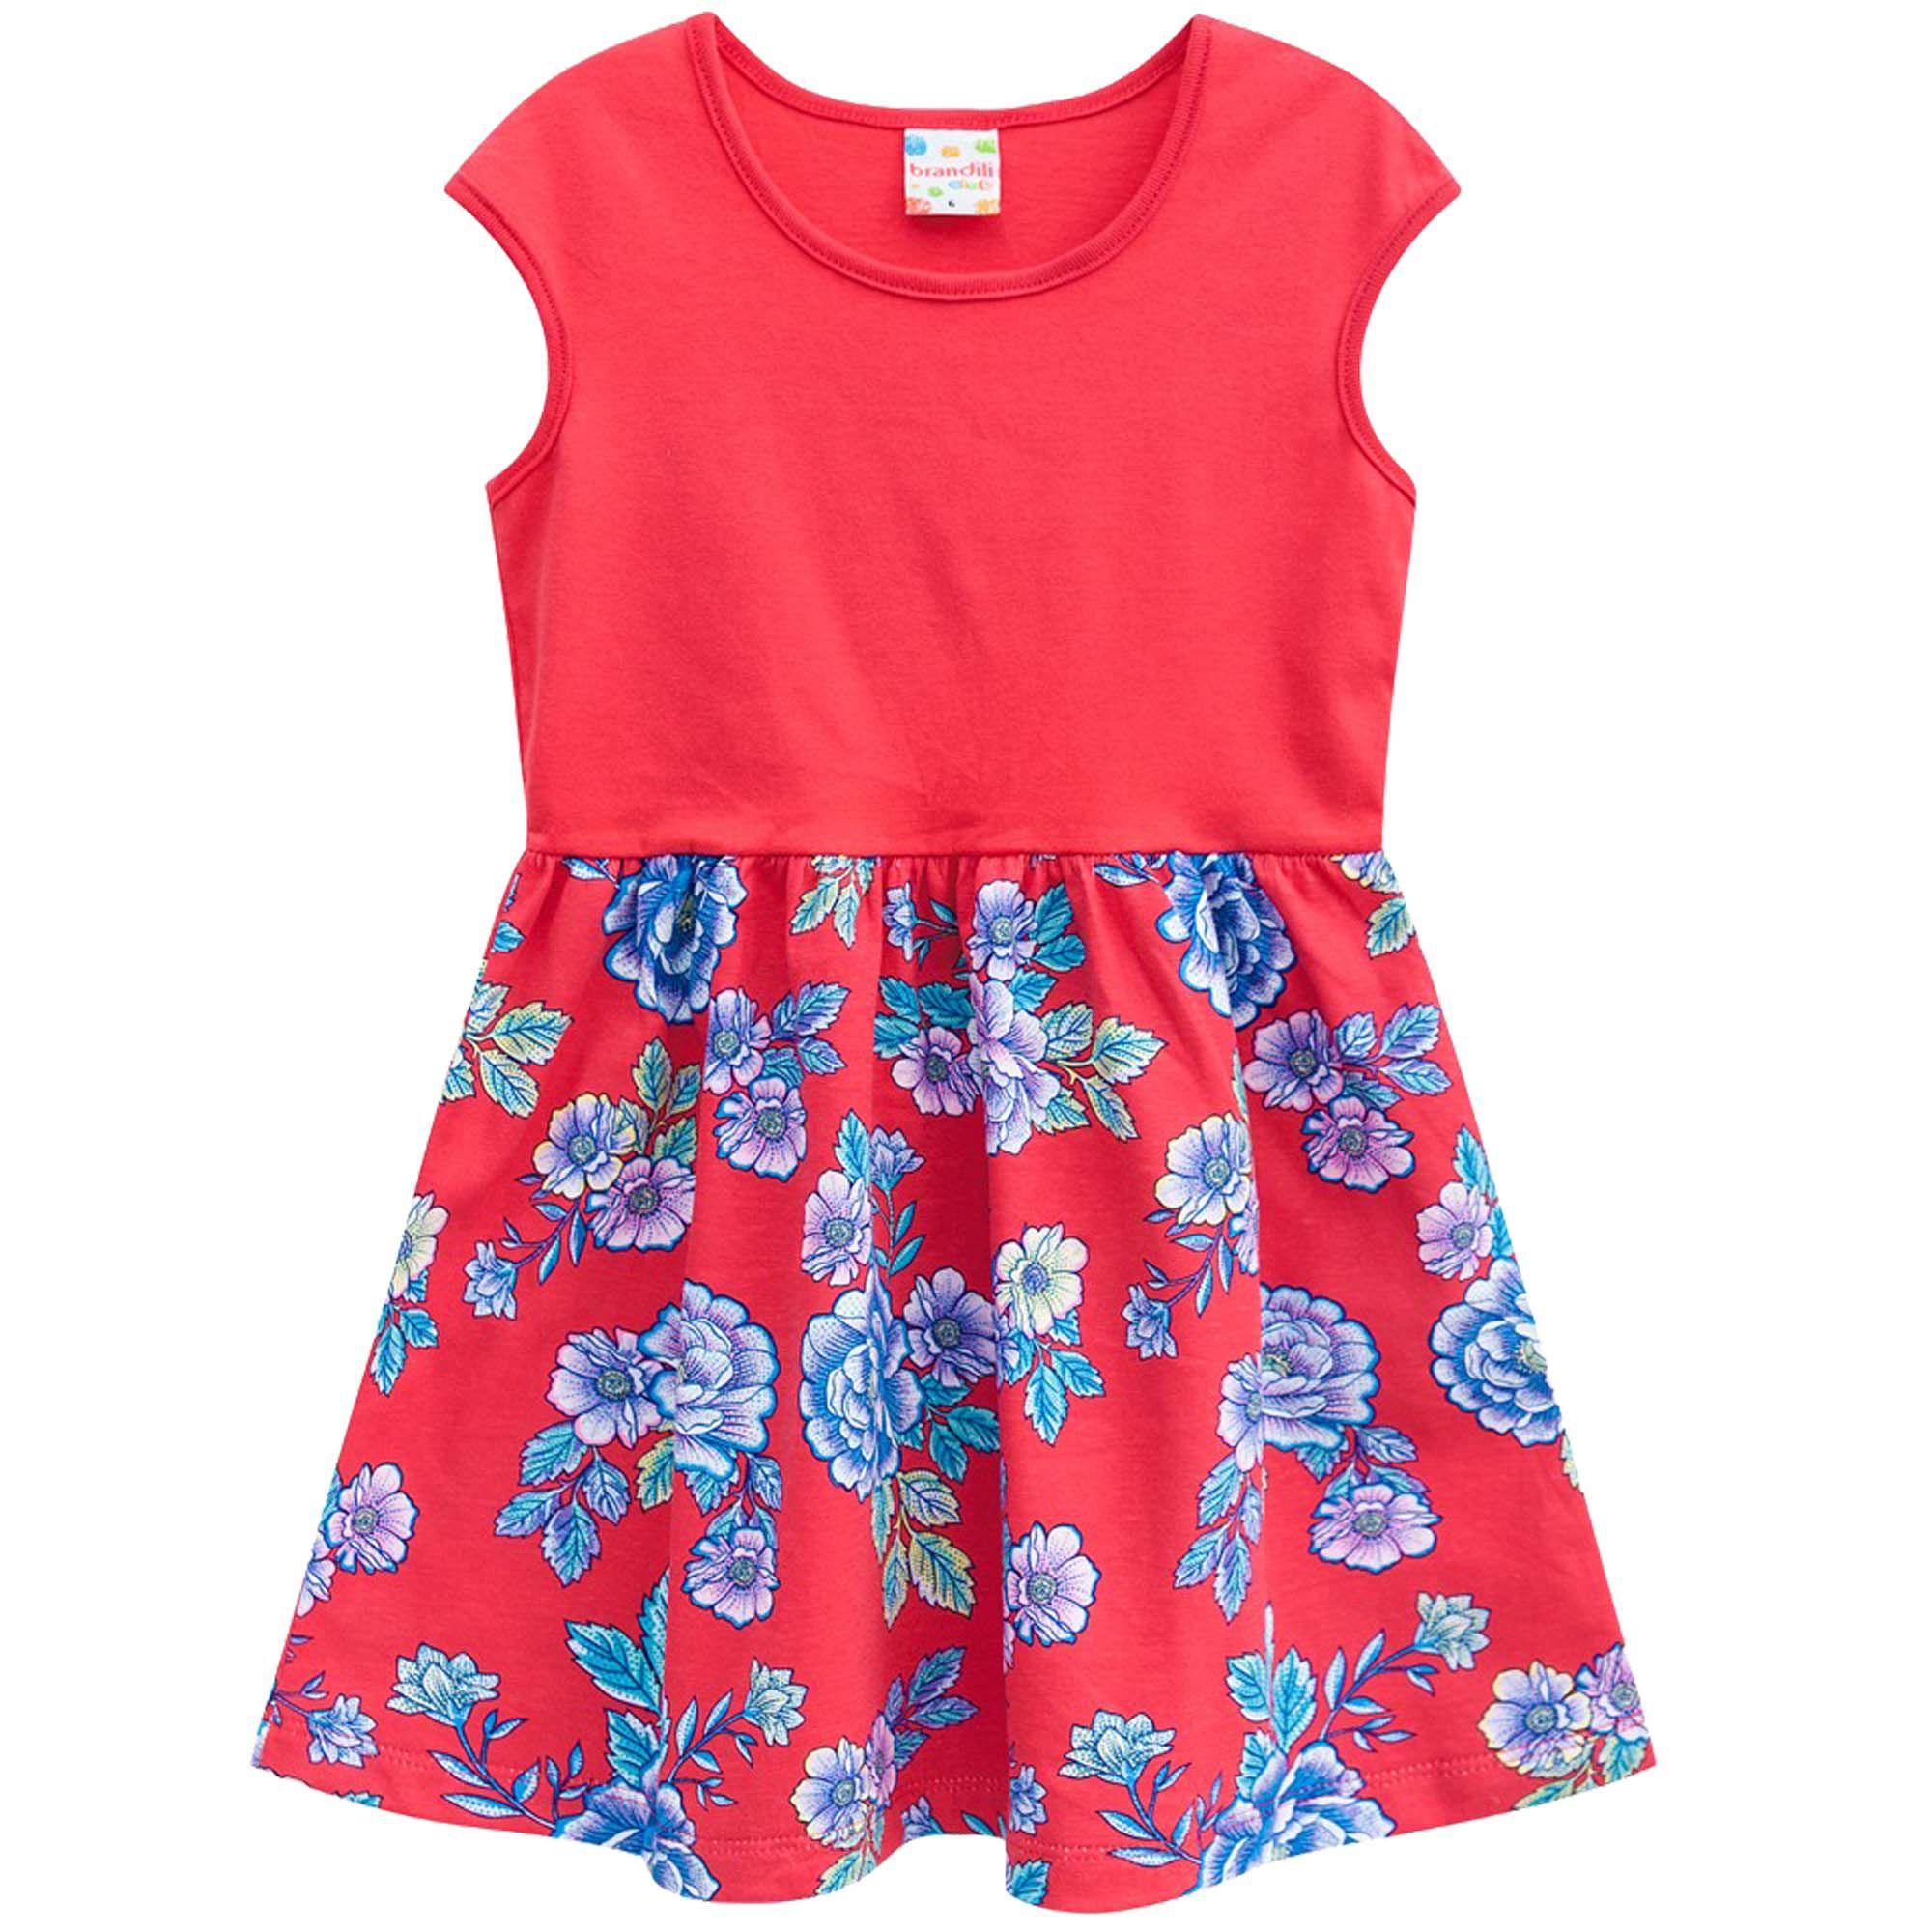 Vestido Verão Brandili Club Floral - 12 ao 16